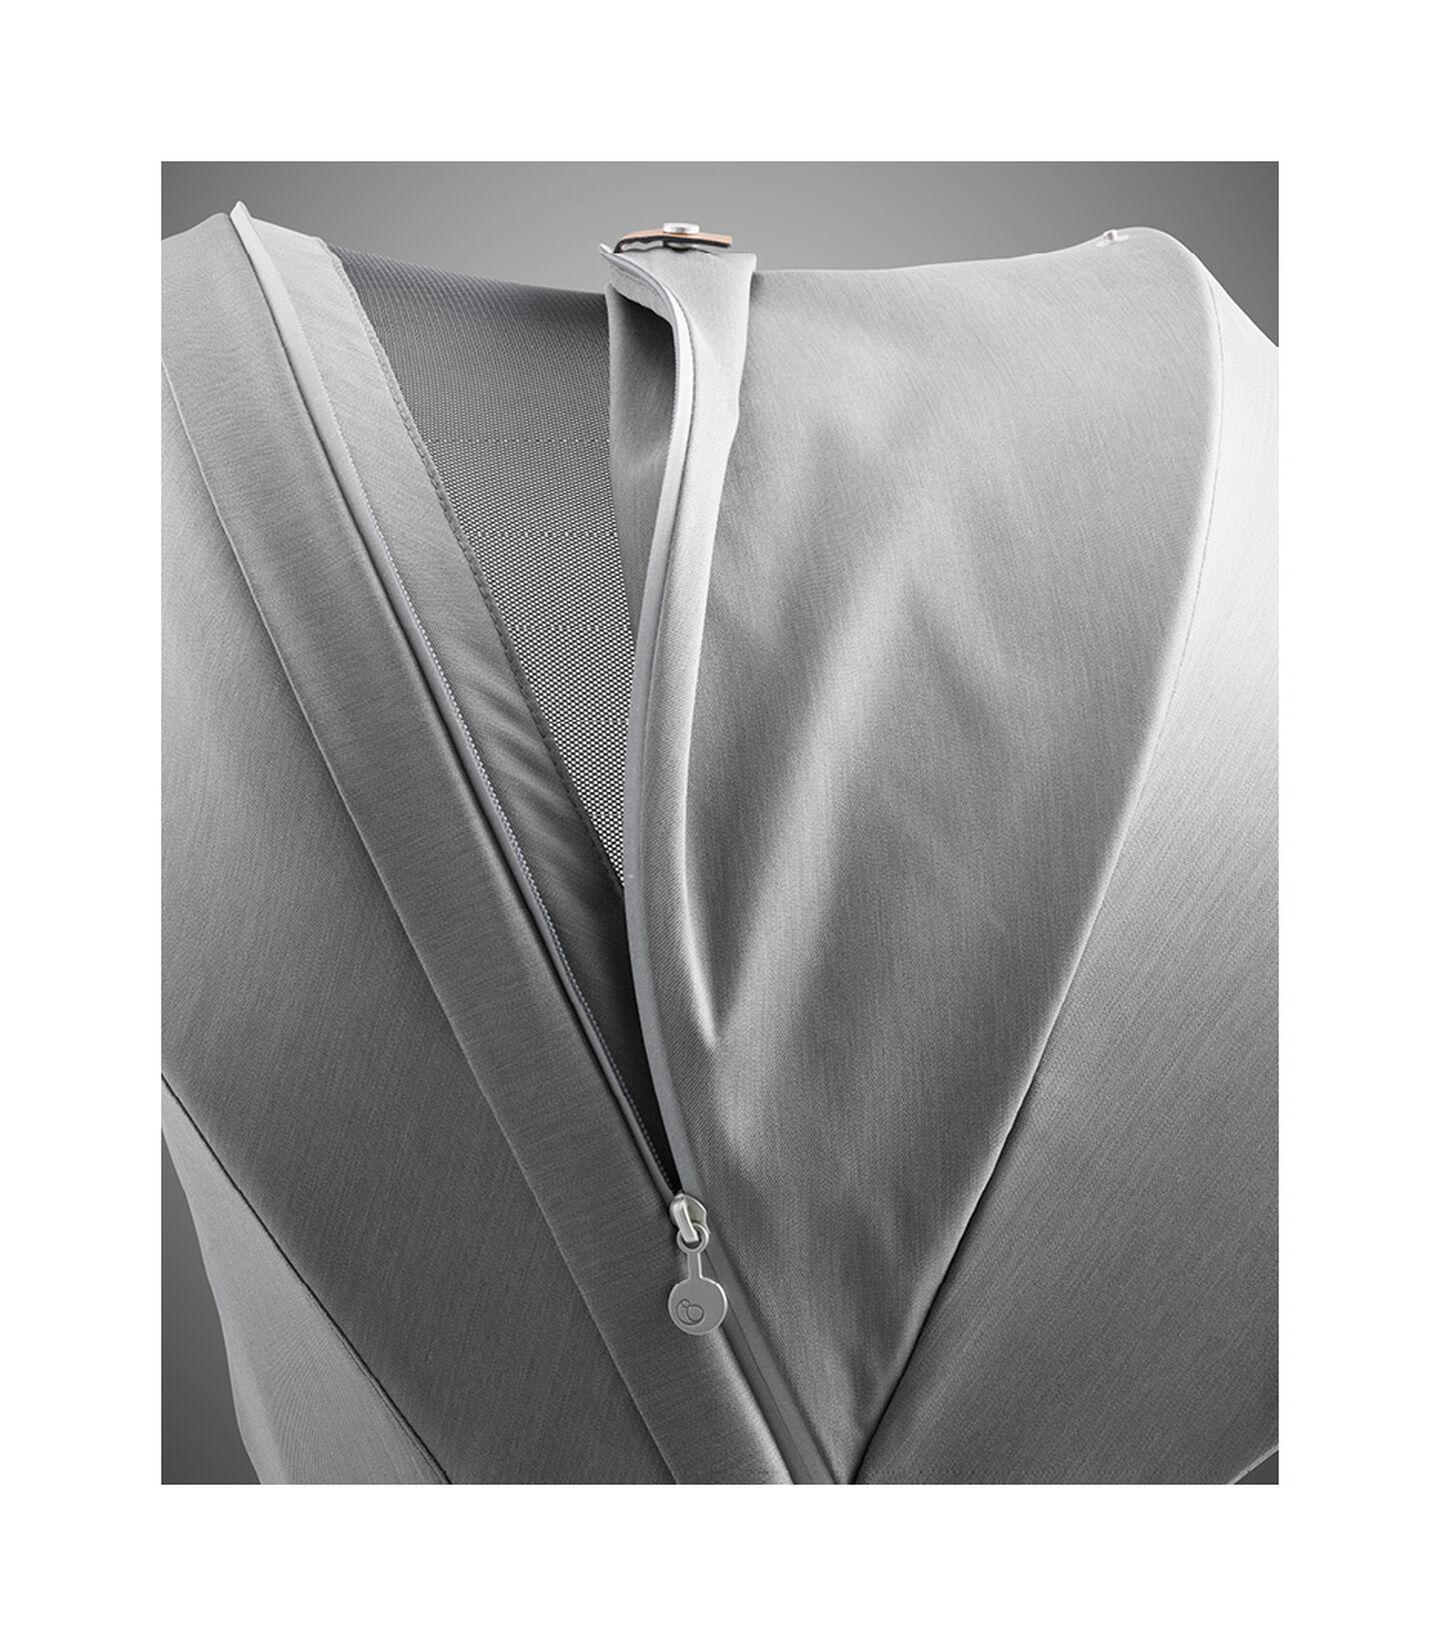 Stokke® Xplory® X Modern Grey Stroller Detail Canopy Ventilation view 9